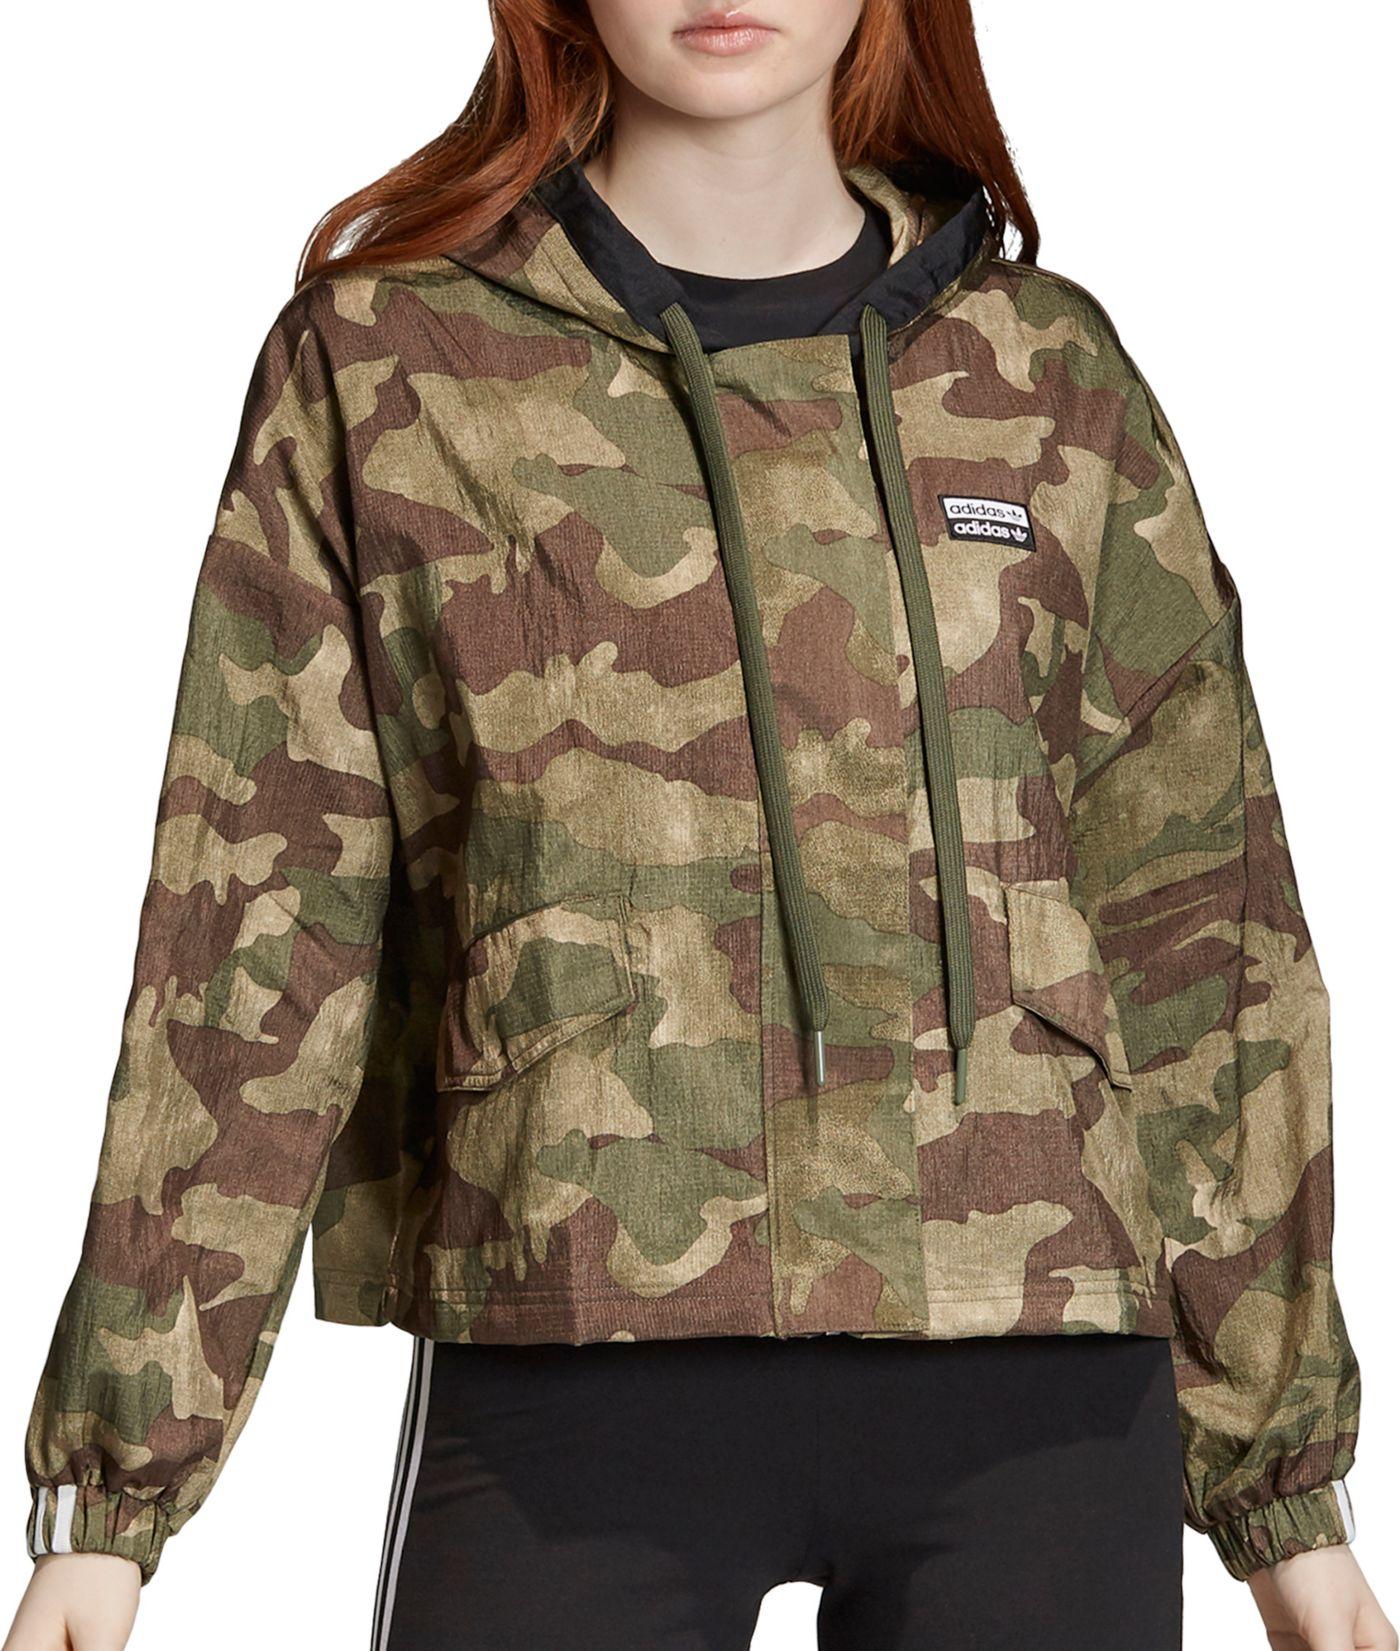 adidas Originals Women's Vocal Camo Windbreaker Jacket